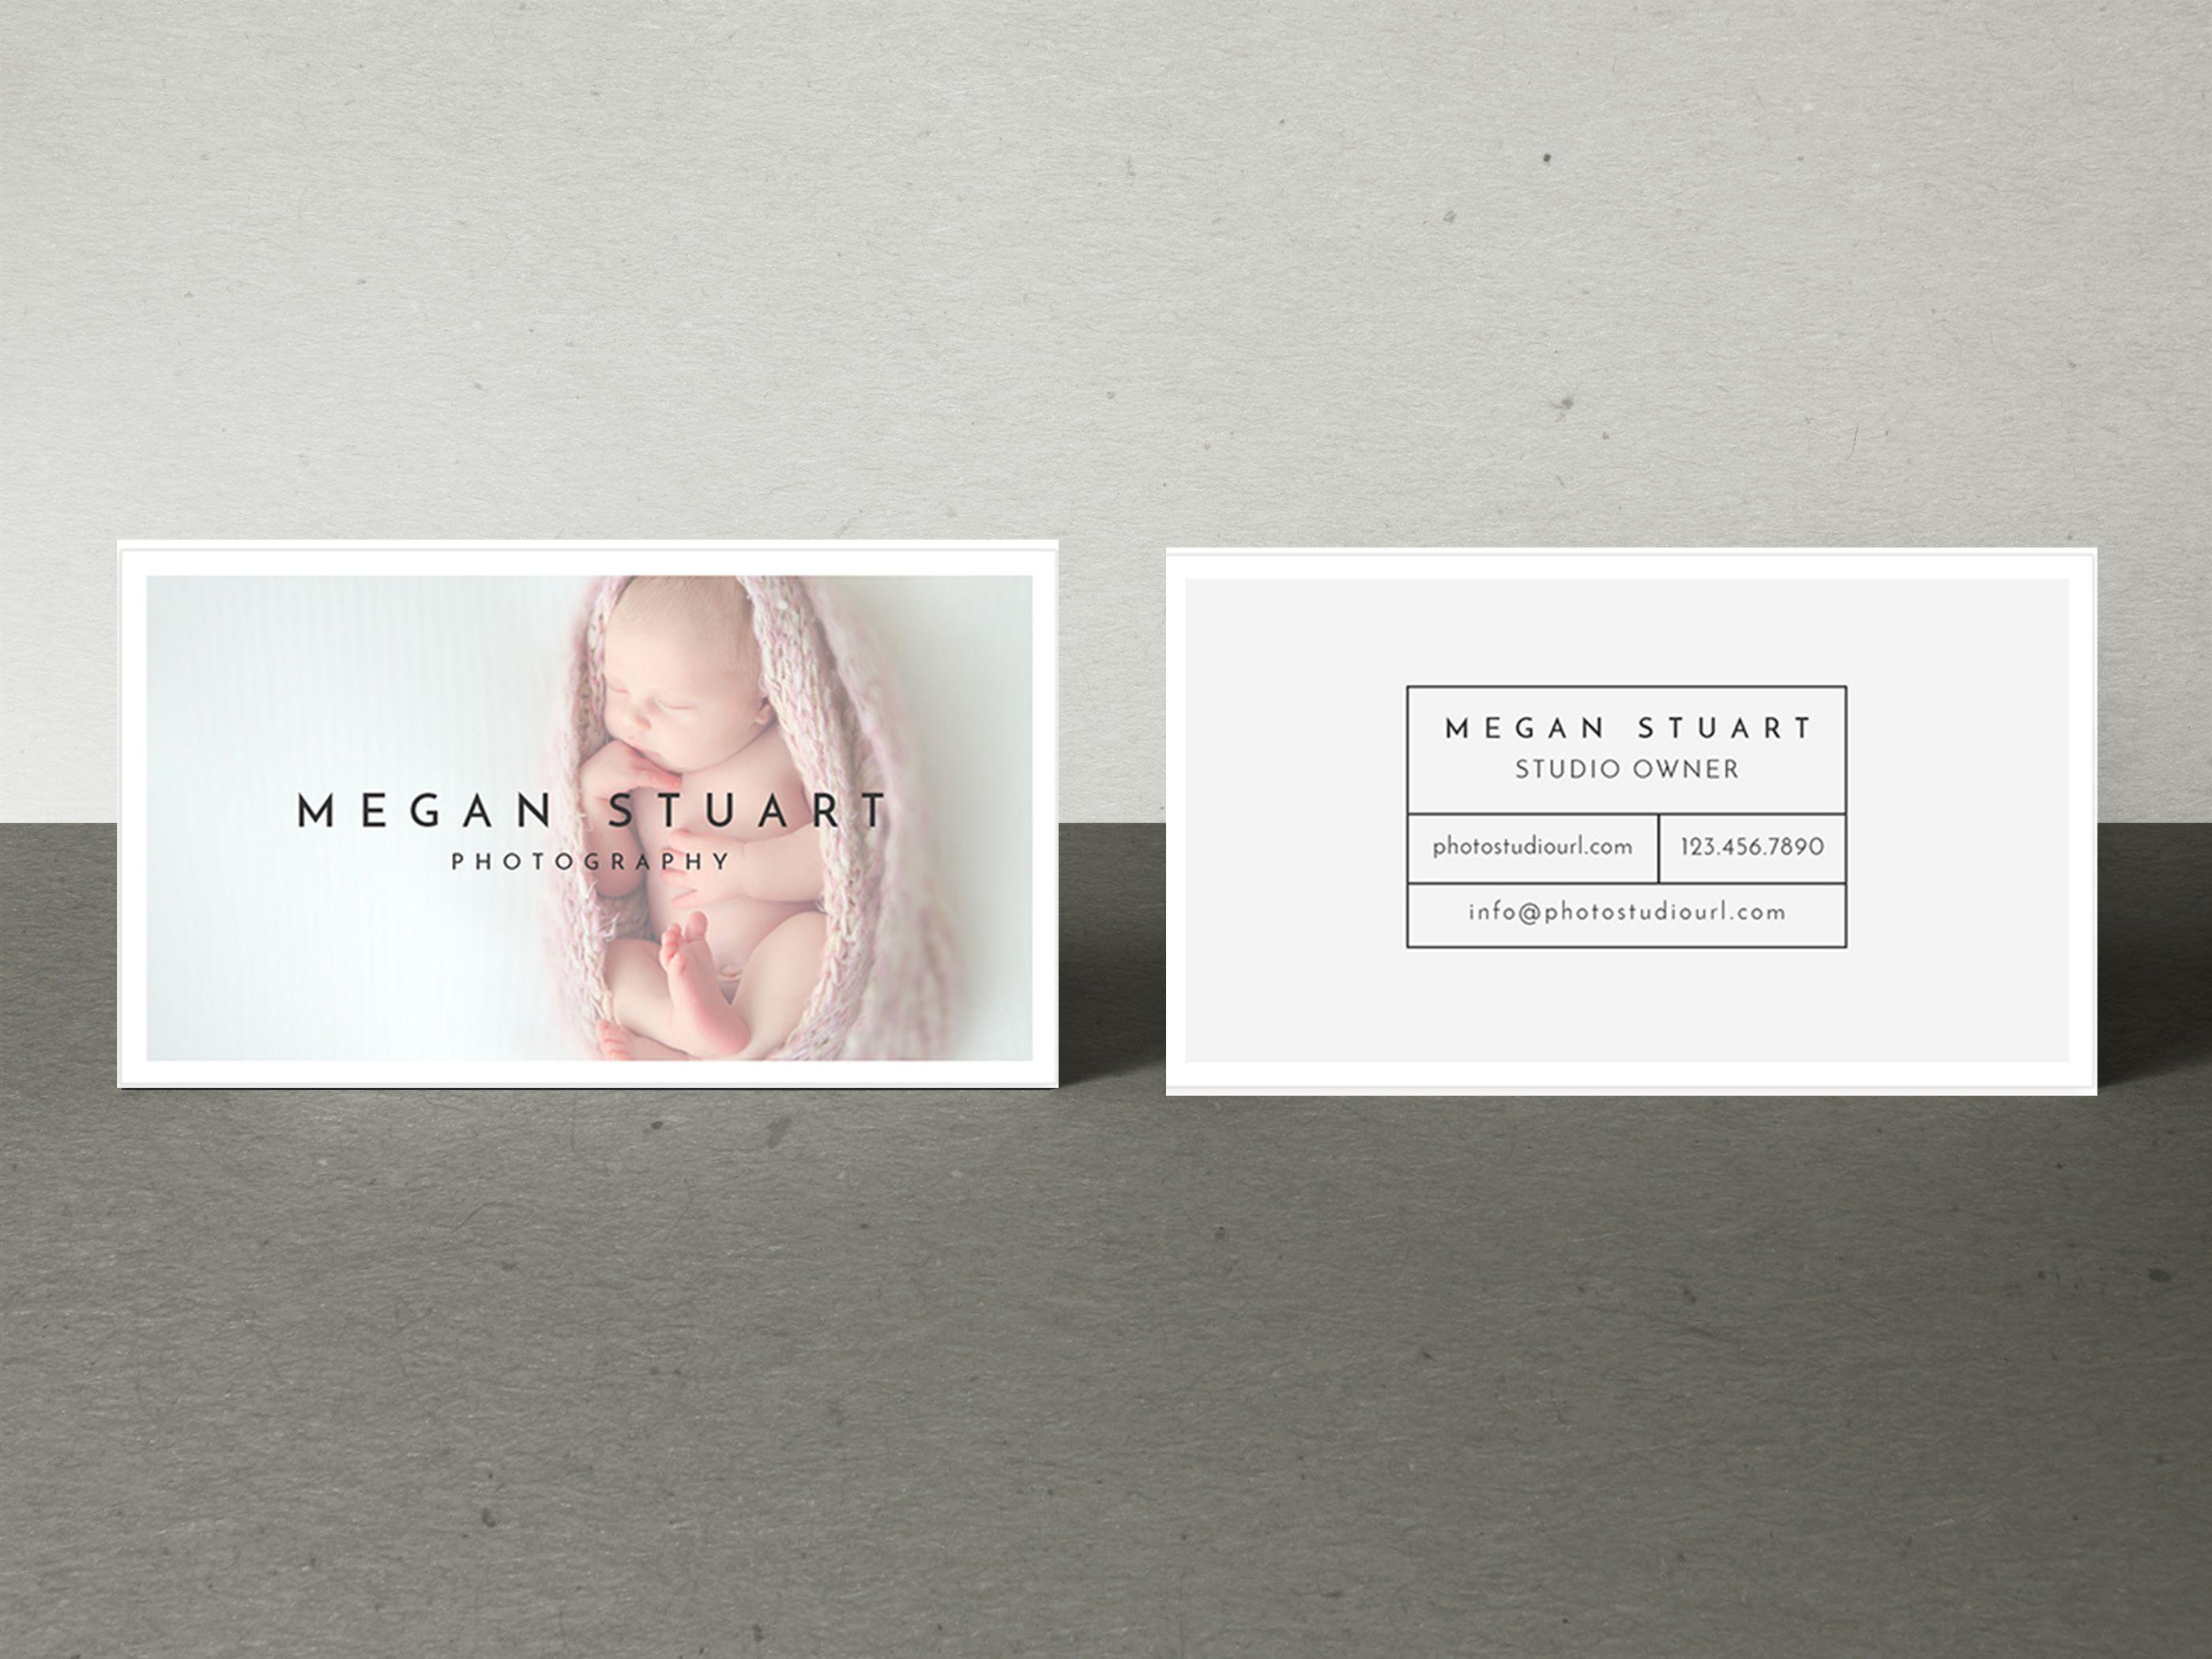 Newborn Photography Business Card Template Mockaroon Newborn Photography Business Cards Photography Business Cards Template Photography Business Cards